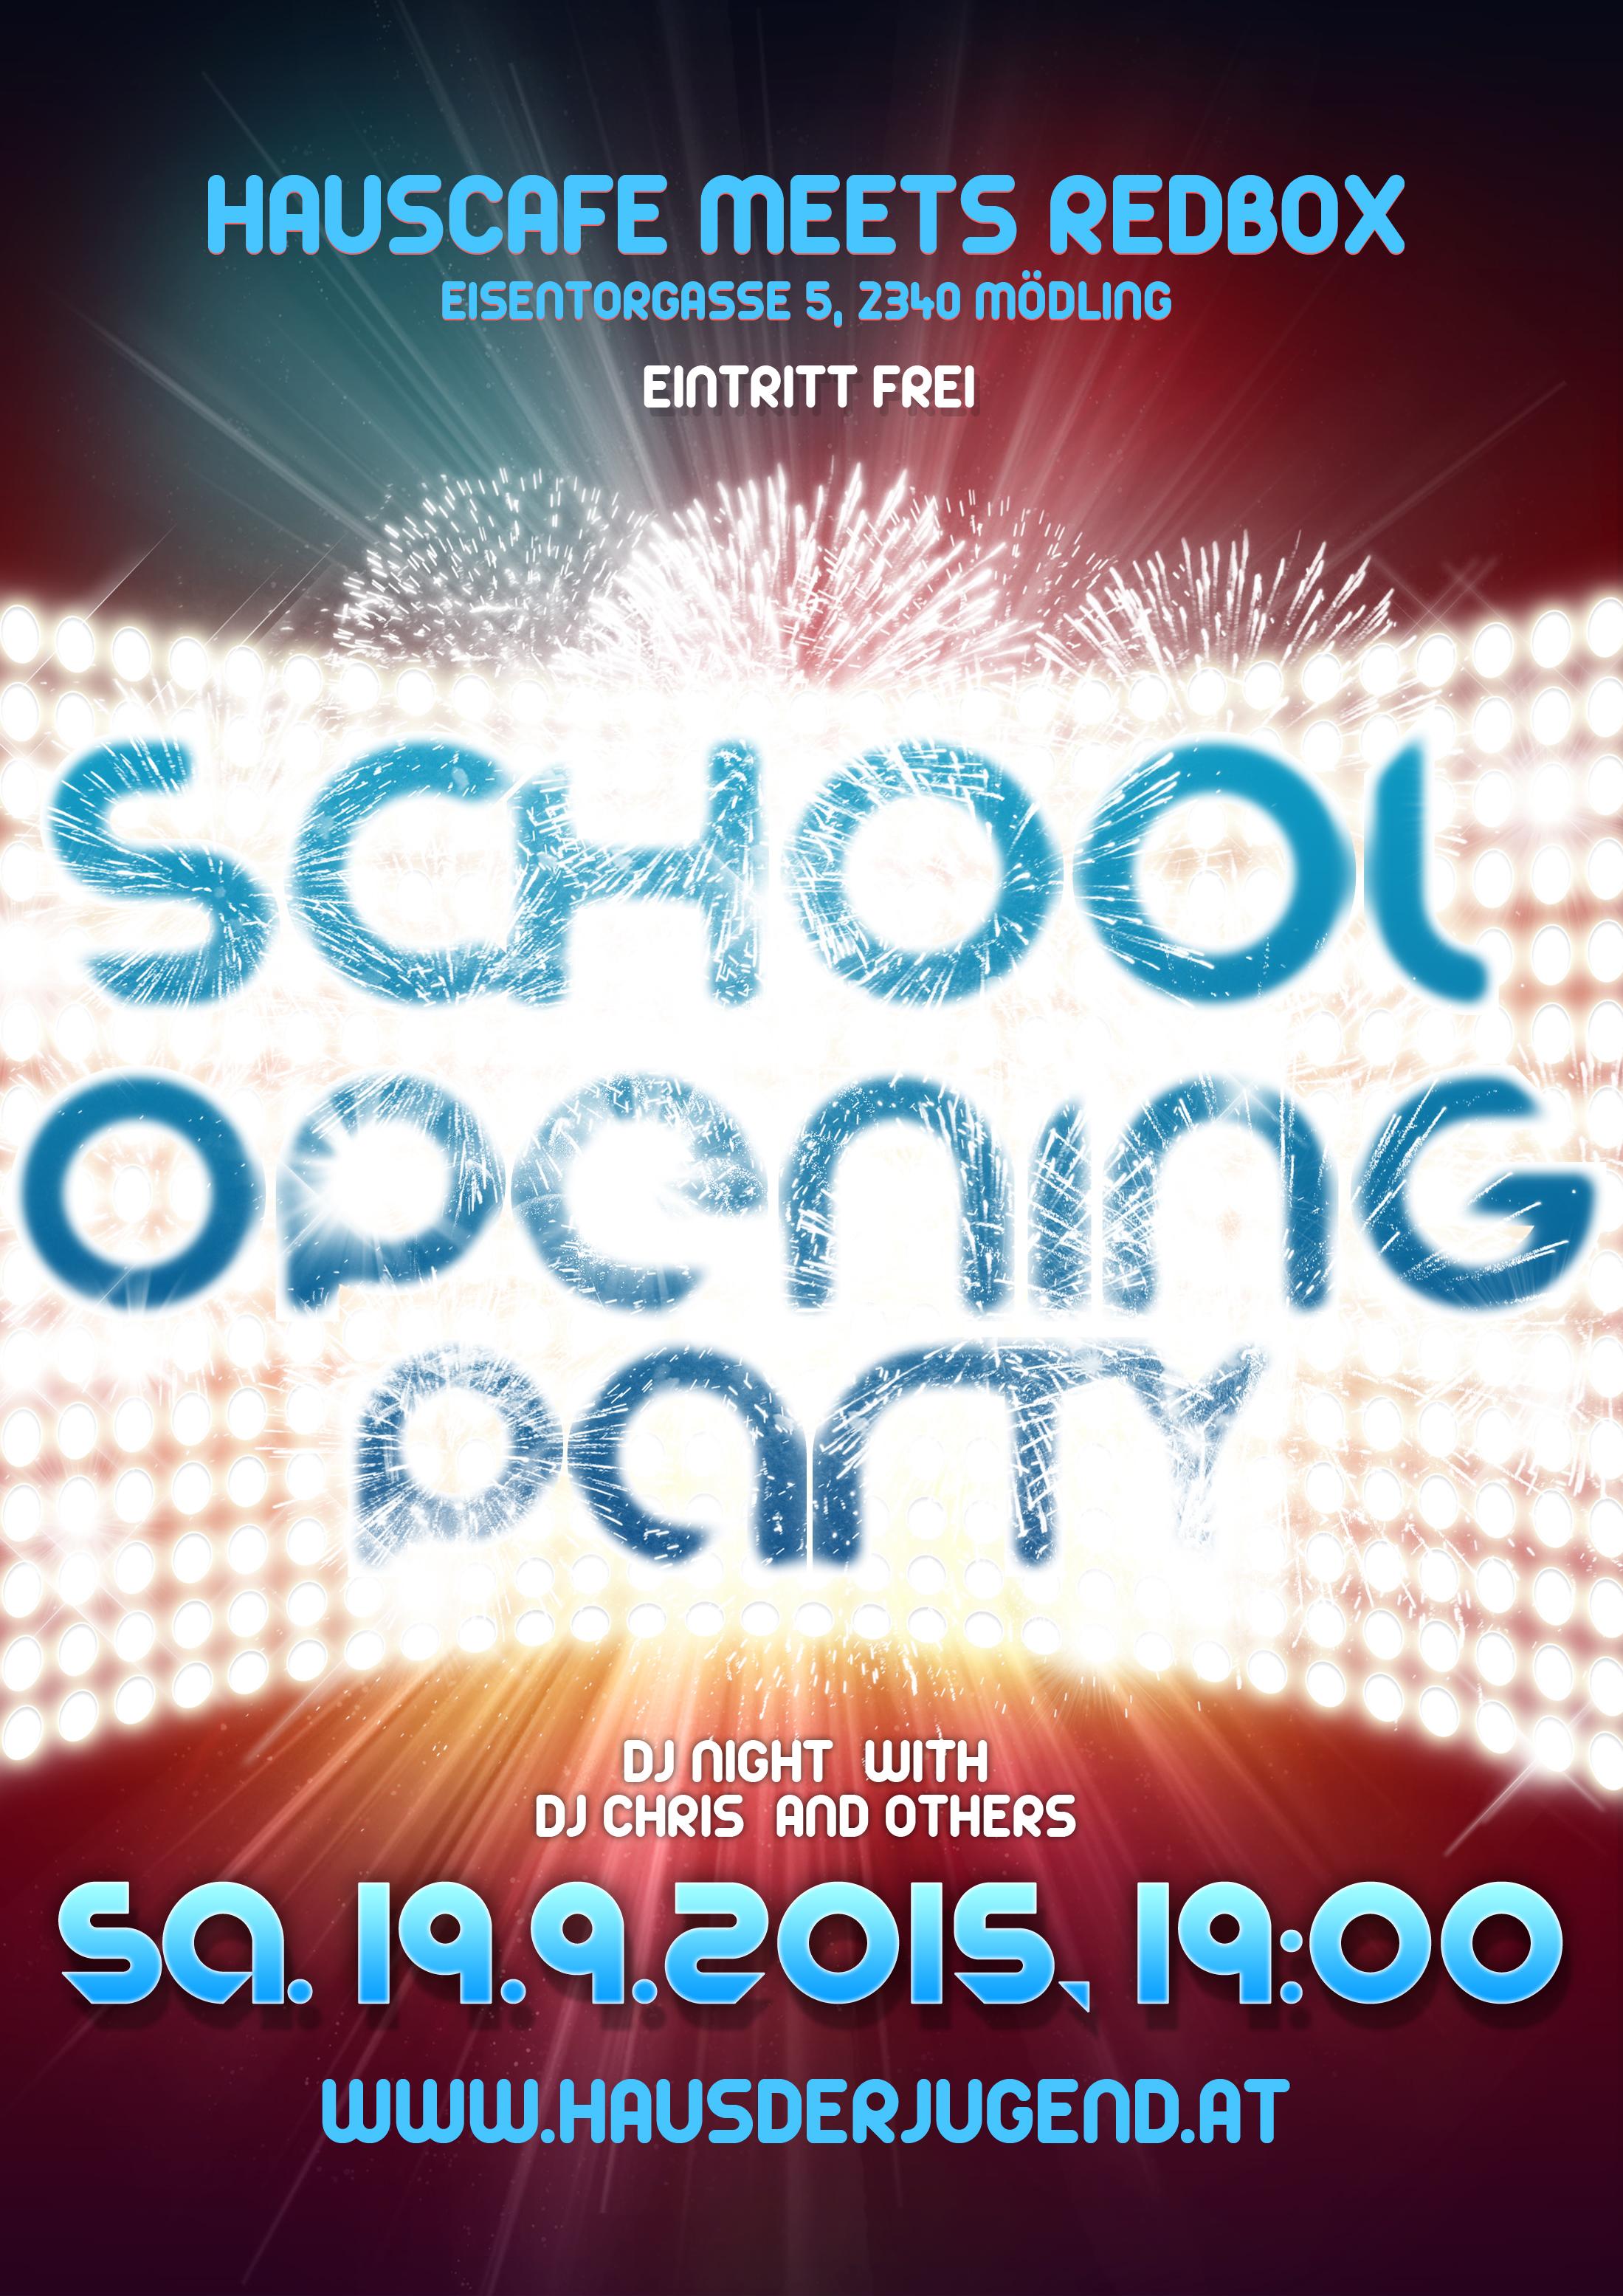 School Opening Party Hauscafe Meets Redbox Haus Der Jugend